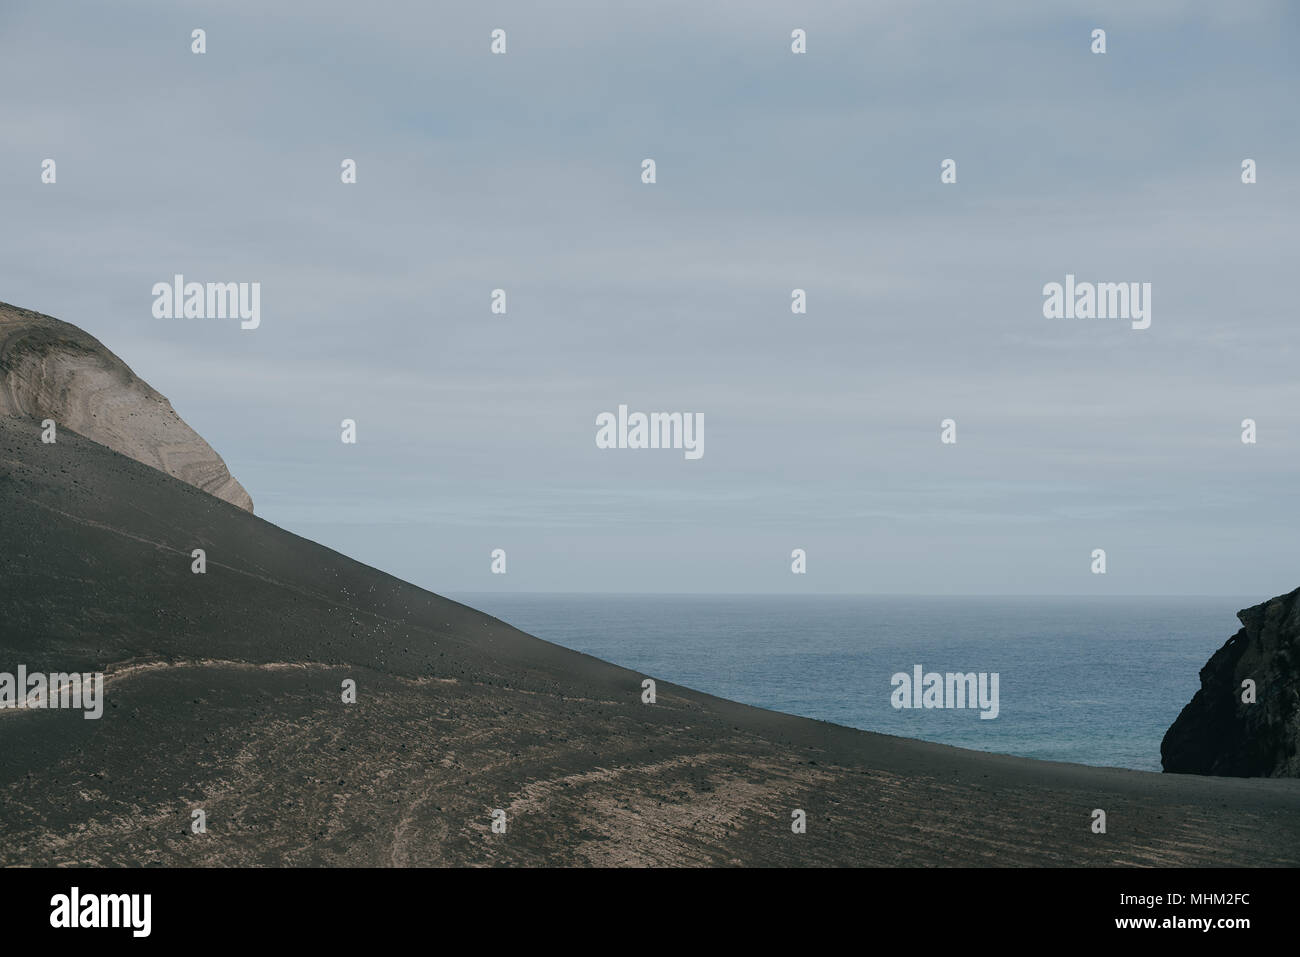 capelinhos on faial island, azores Stock Photo